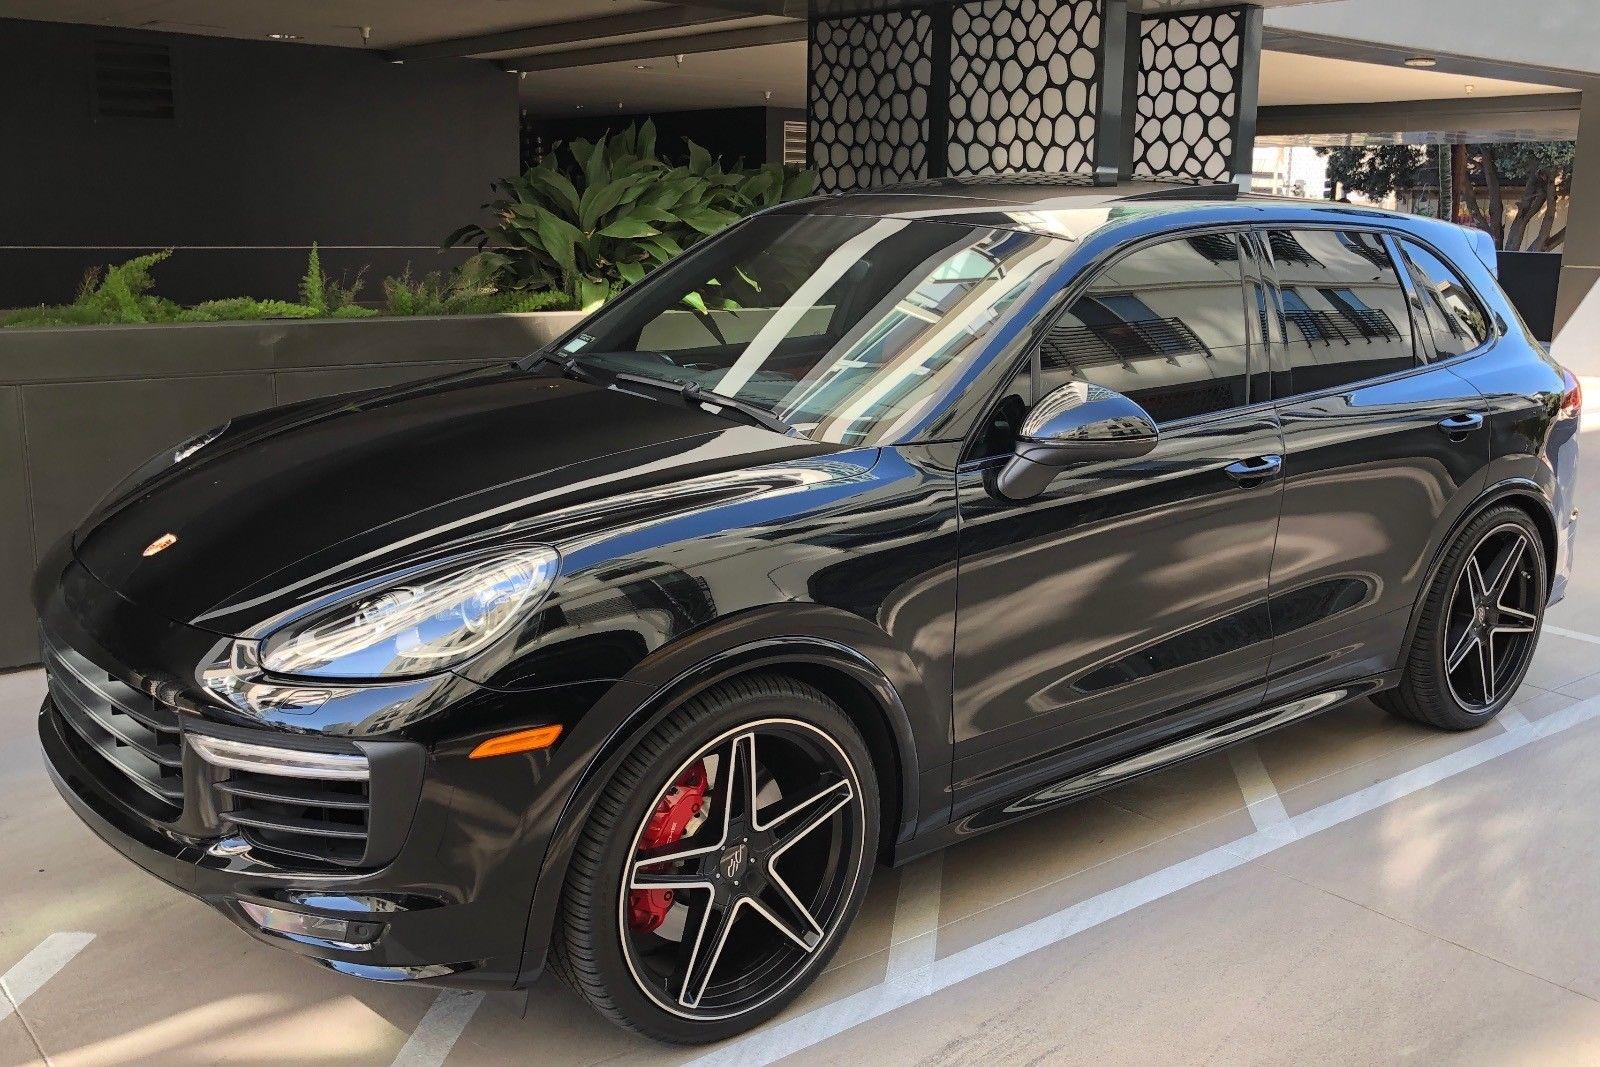 Awesome 2016 Porsche Cayenne Gts 2016 Porsche Cayenne Gts Black Premium Plus Package 22 Wheels